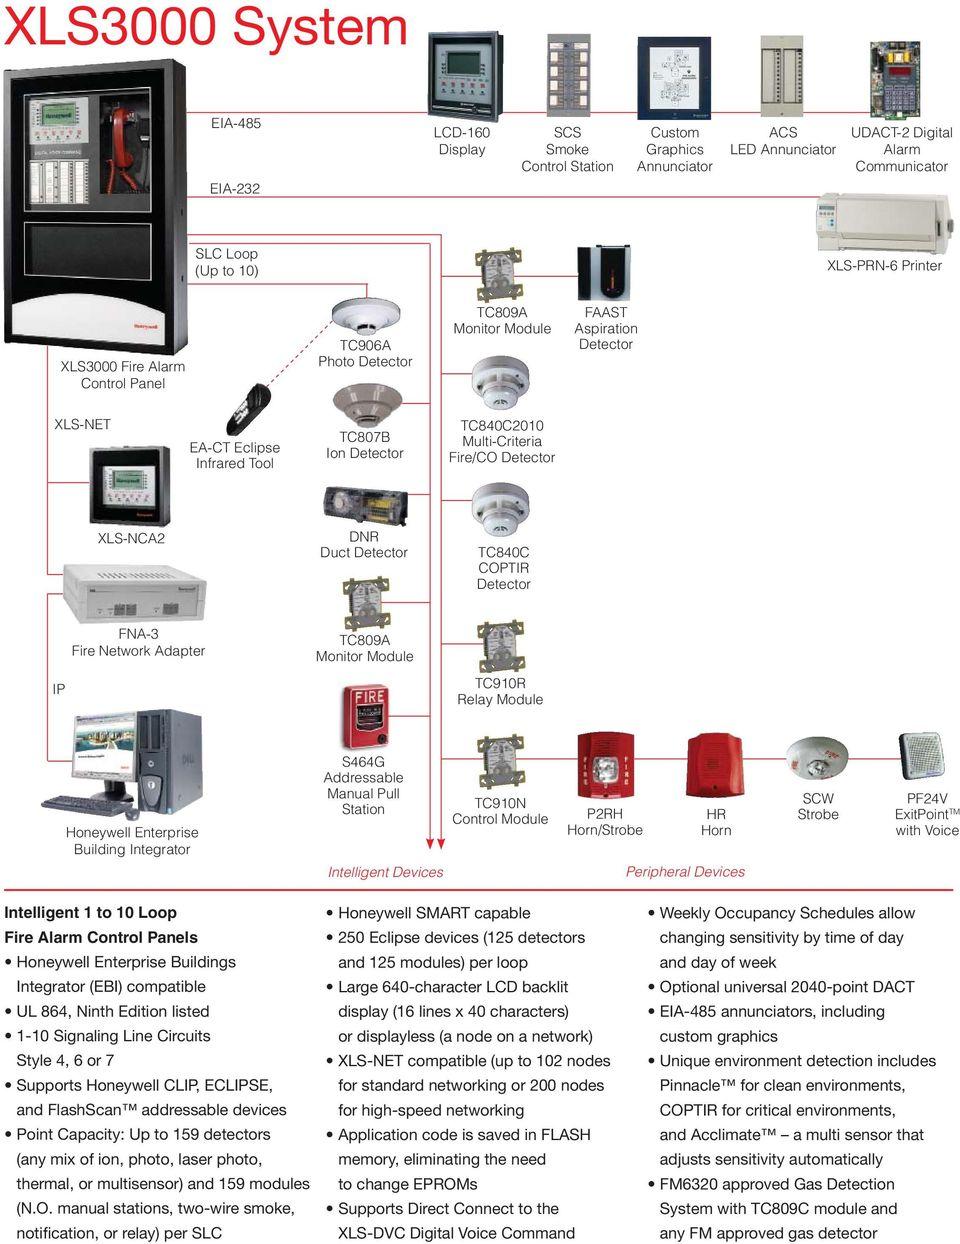 medium resolution of network adapter tc809a tc910r relay module honeywell enterprise building integrator s464g addressable manual pull station intelligent